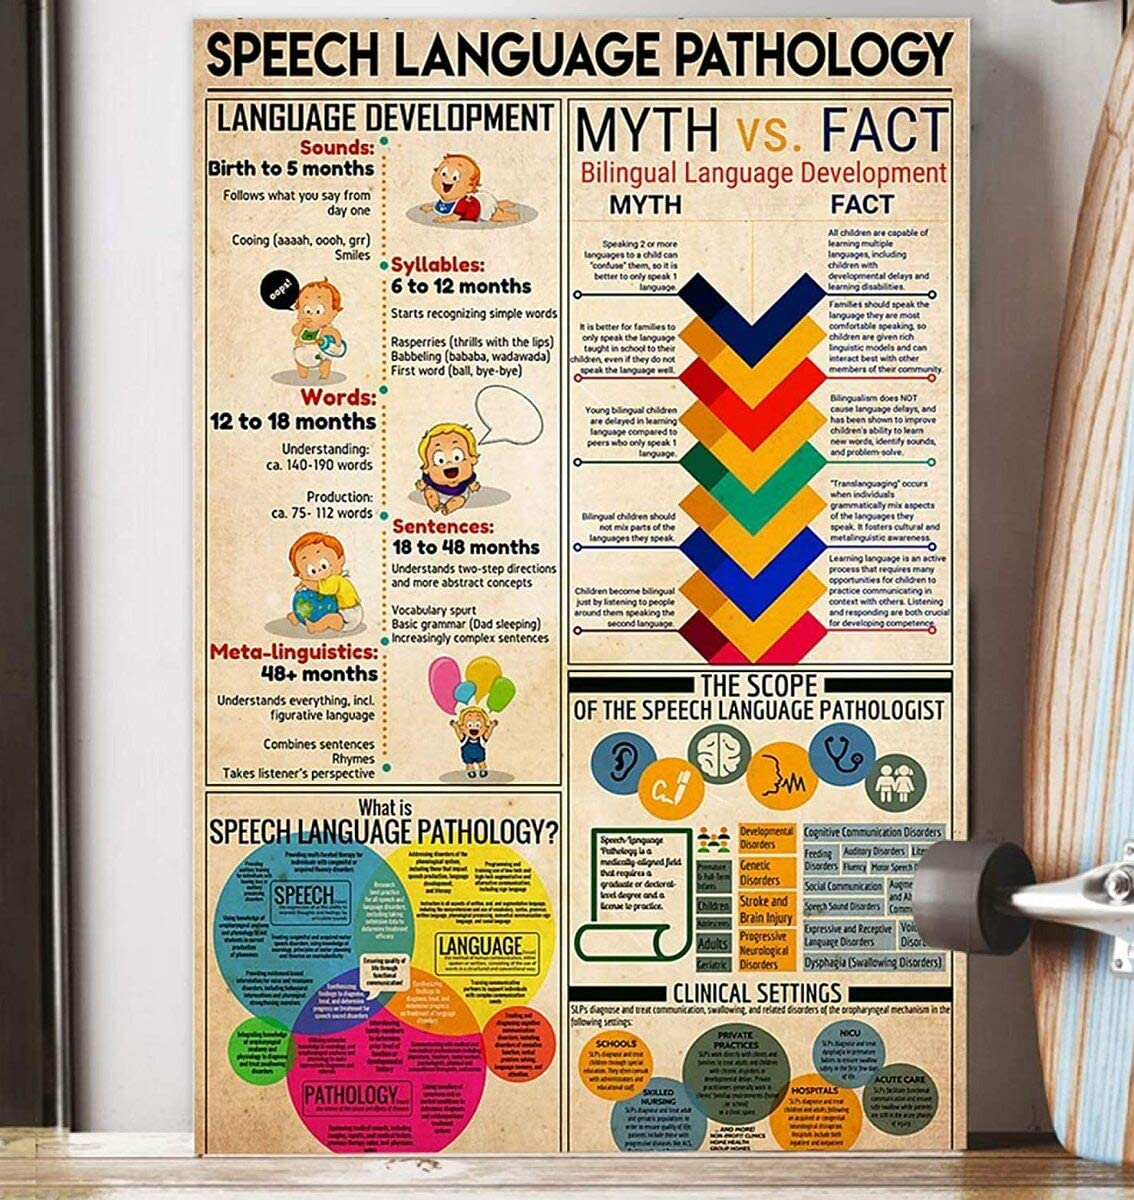 Speech Language Pathology Canvas Decor Home, Wall Art Canvas 0.75 Inch Print Decor (Size 8x12, 12x18, 16x24, 24x36 Inches)